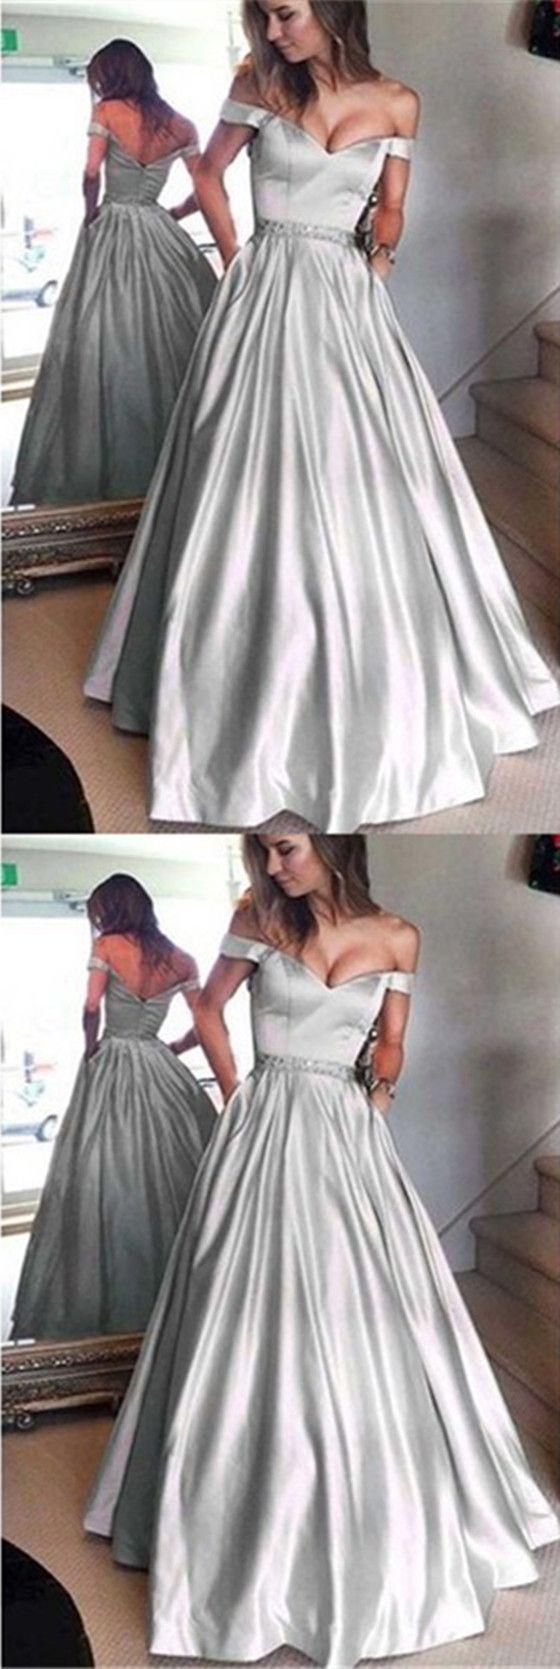 Silver satin off shoulder aline prom dresses zip up beaded long